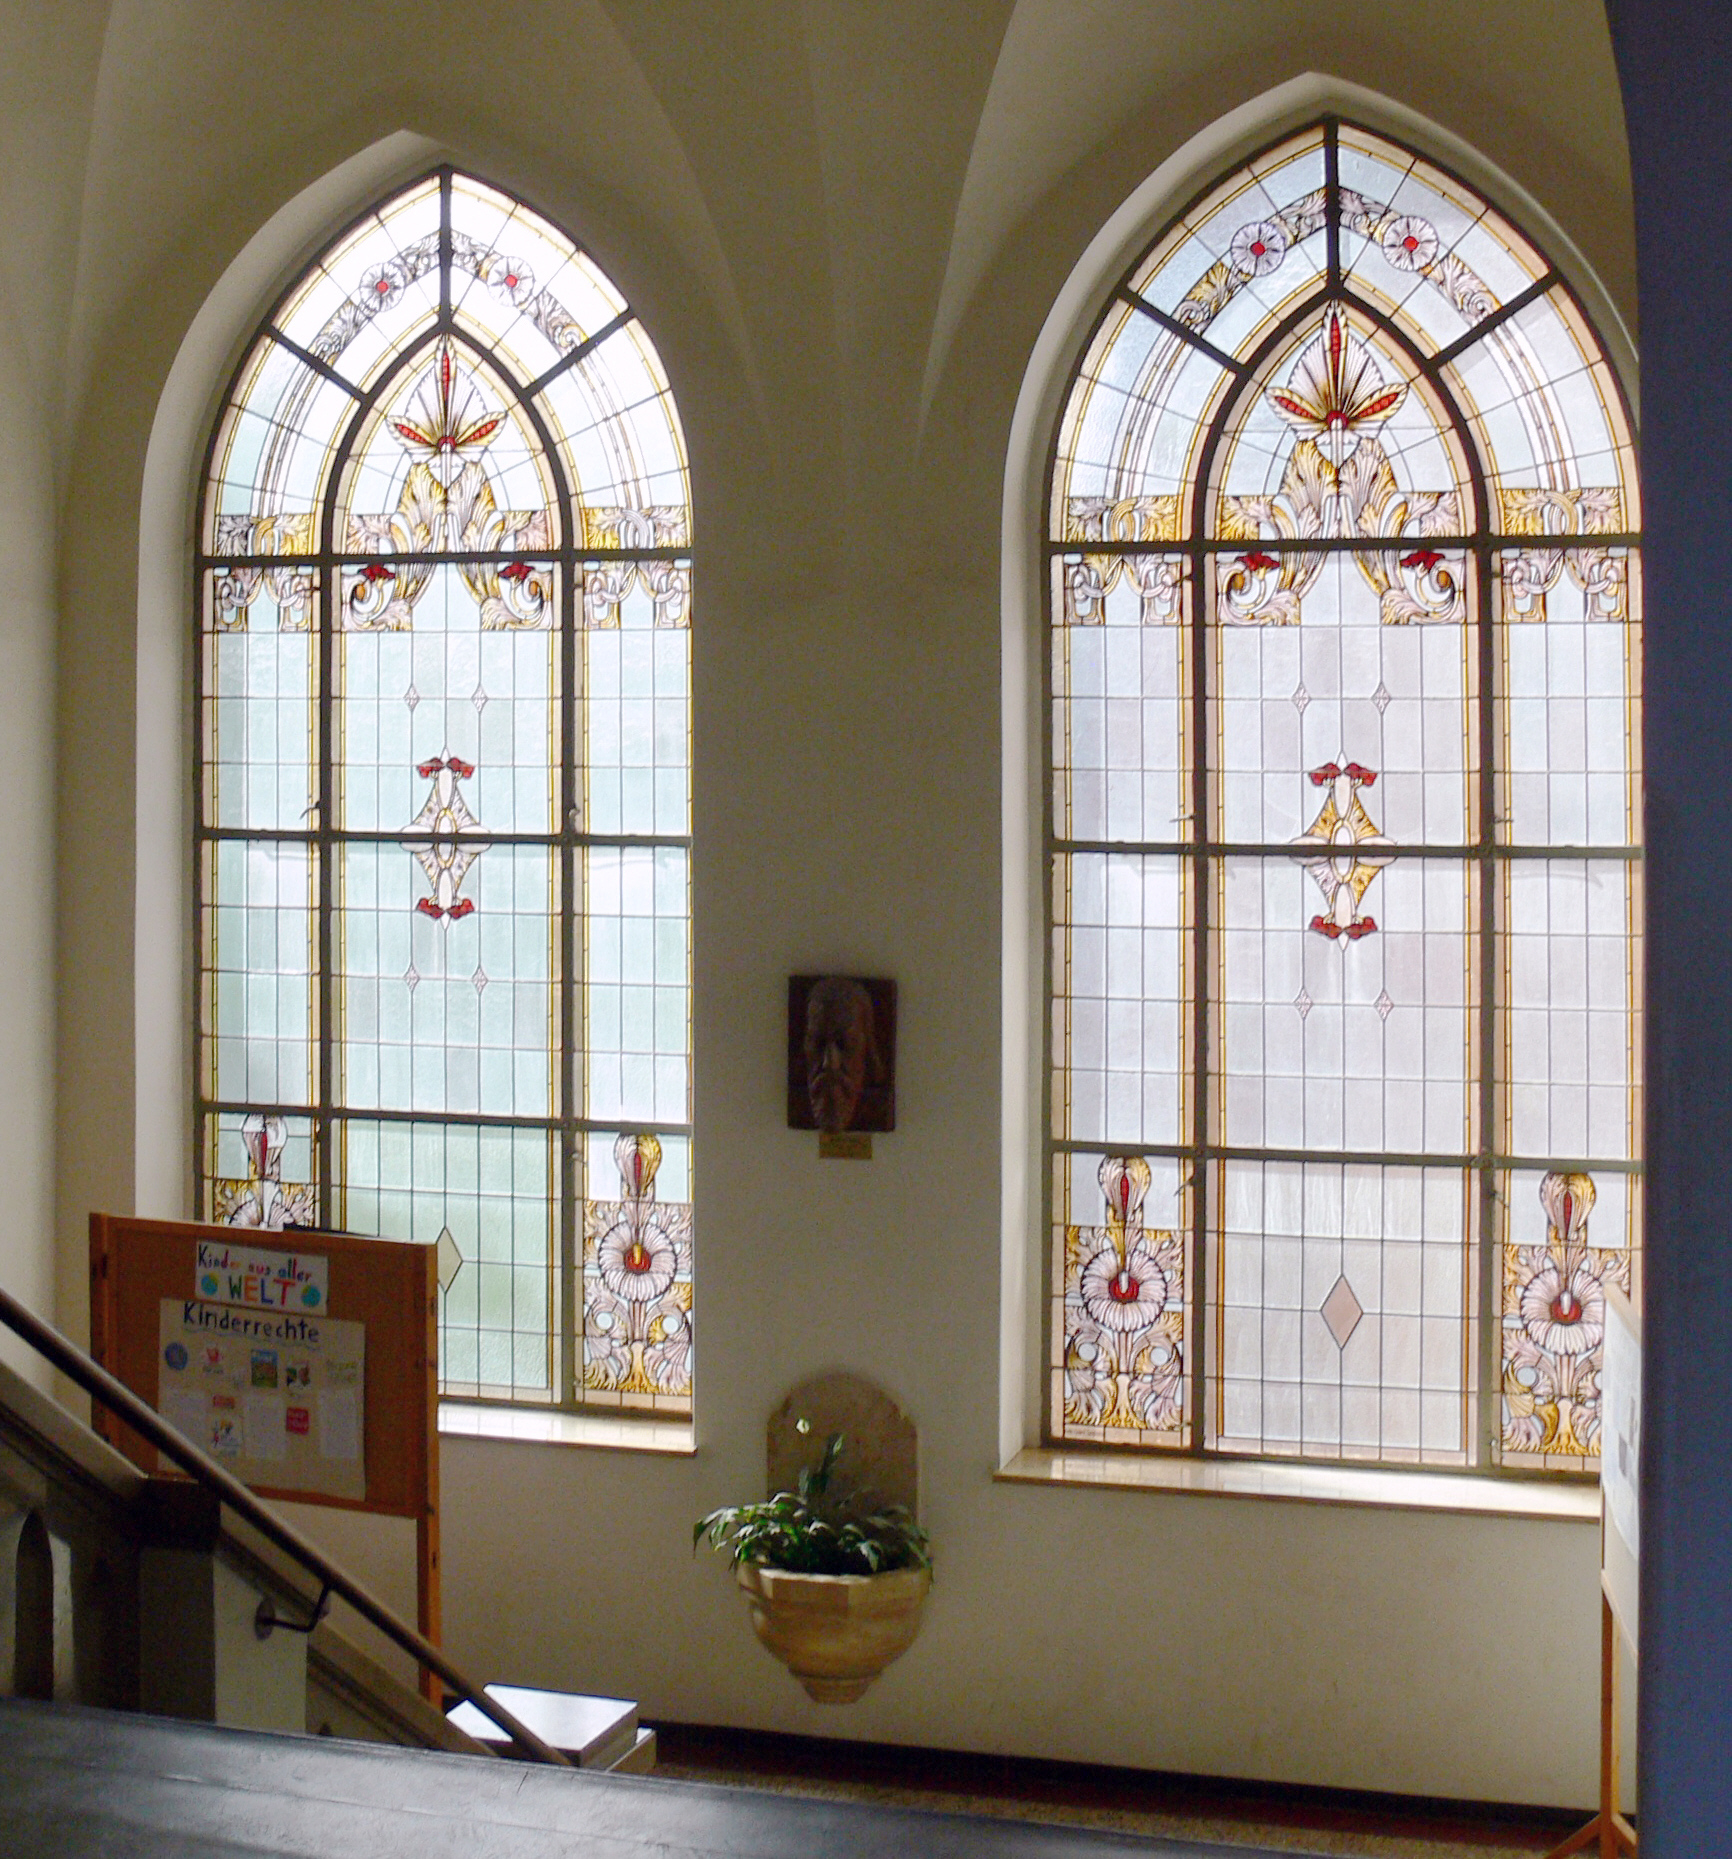 Datei l neburg wilhelm raabe schule treppenhaus fenster 3 for Fenster treppenhaus